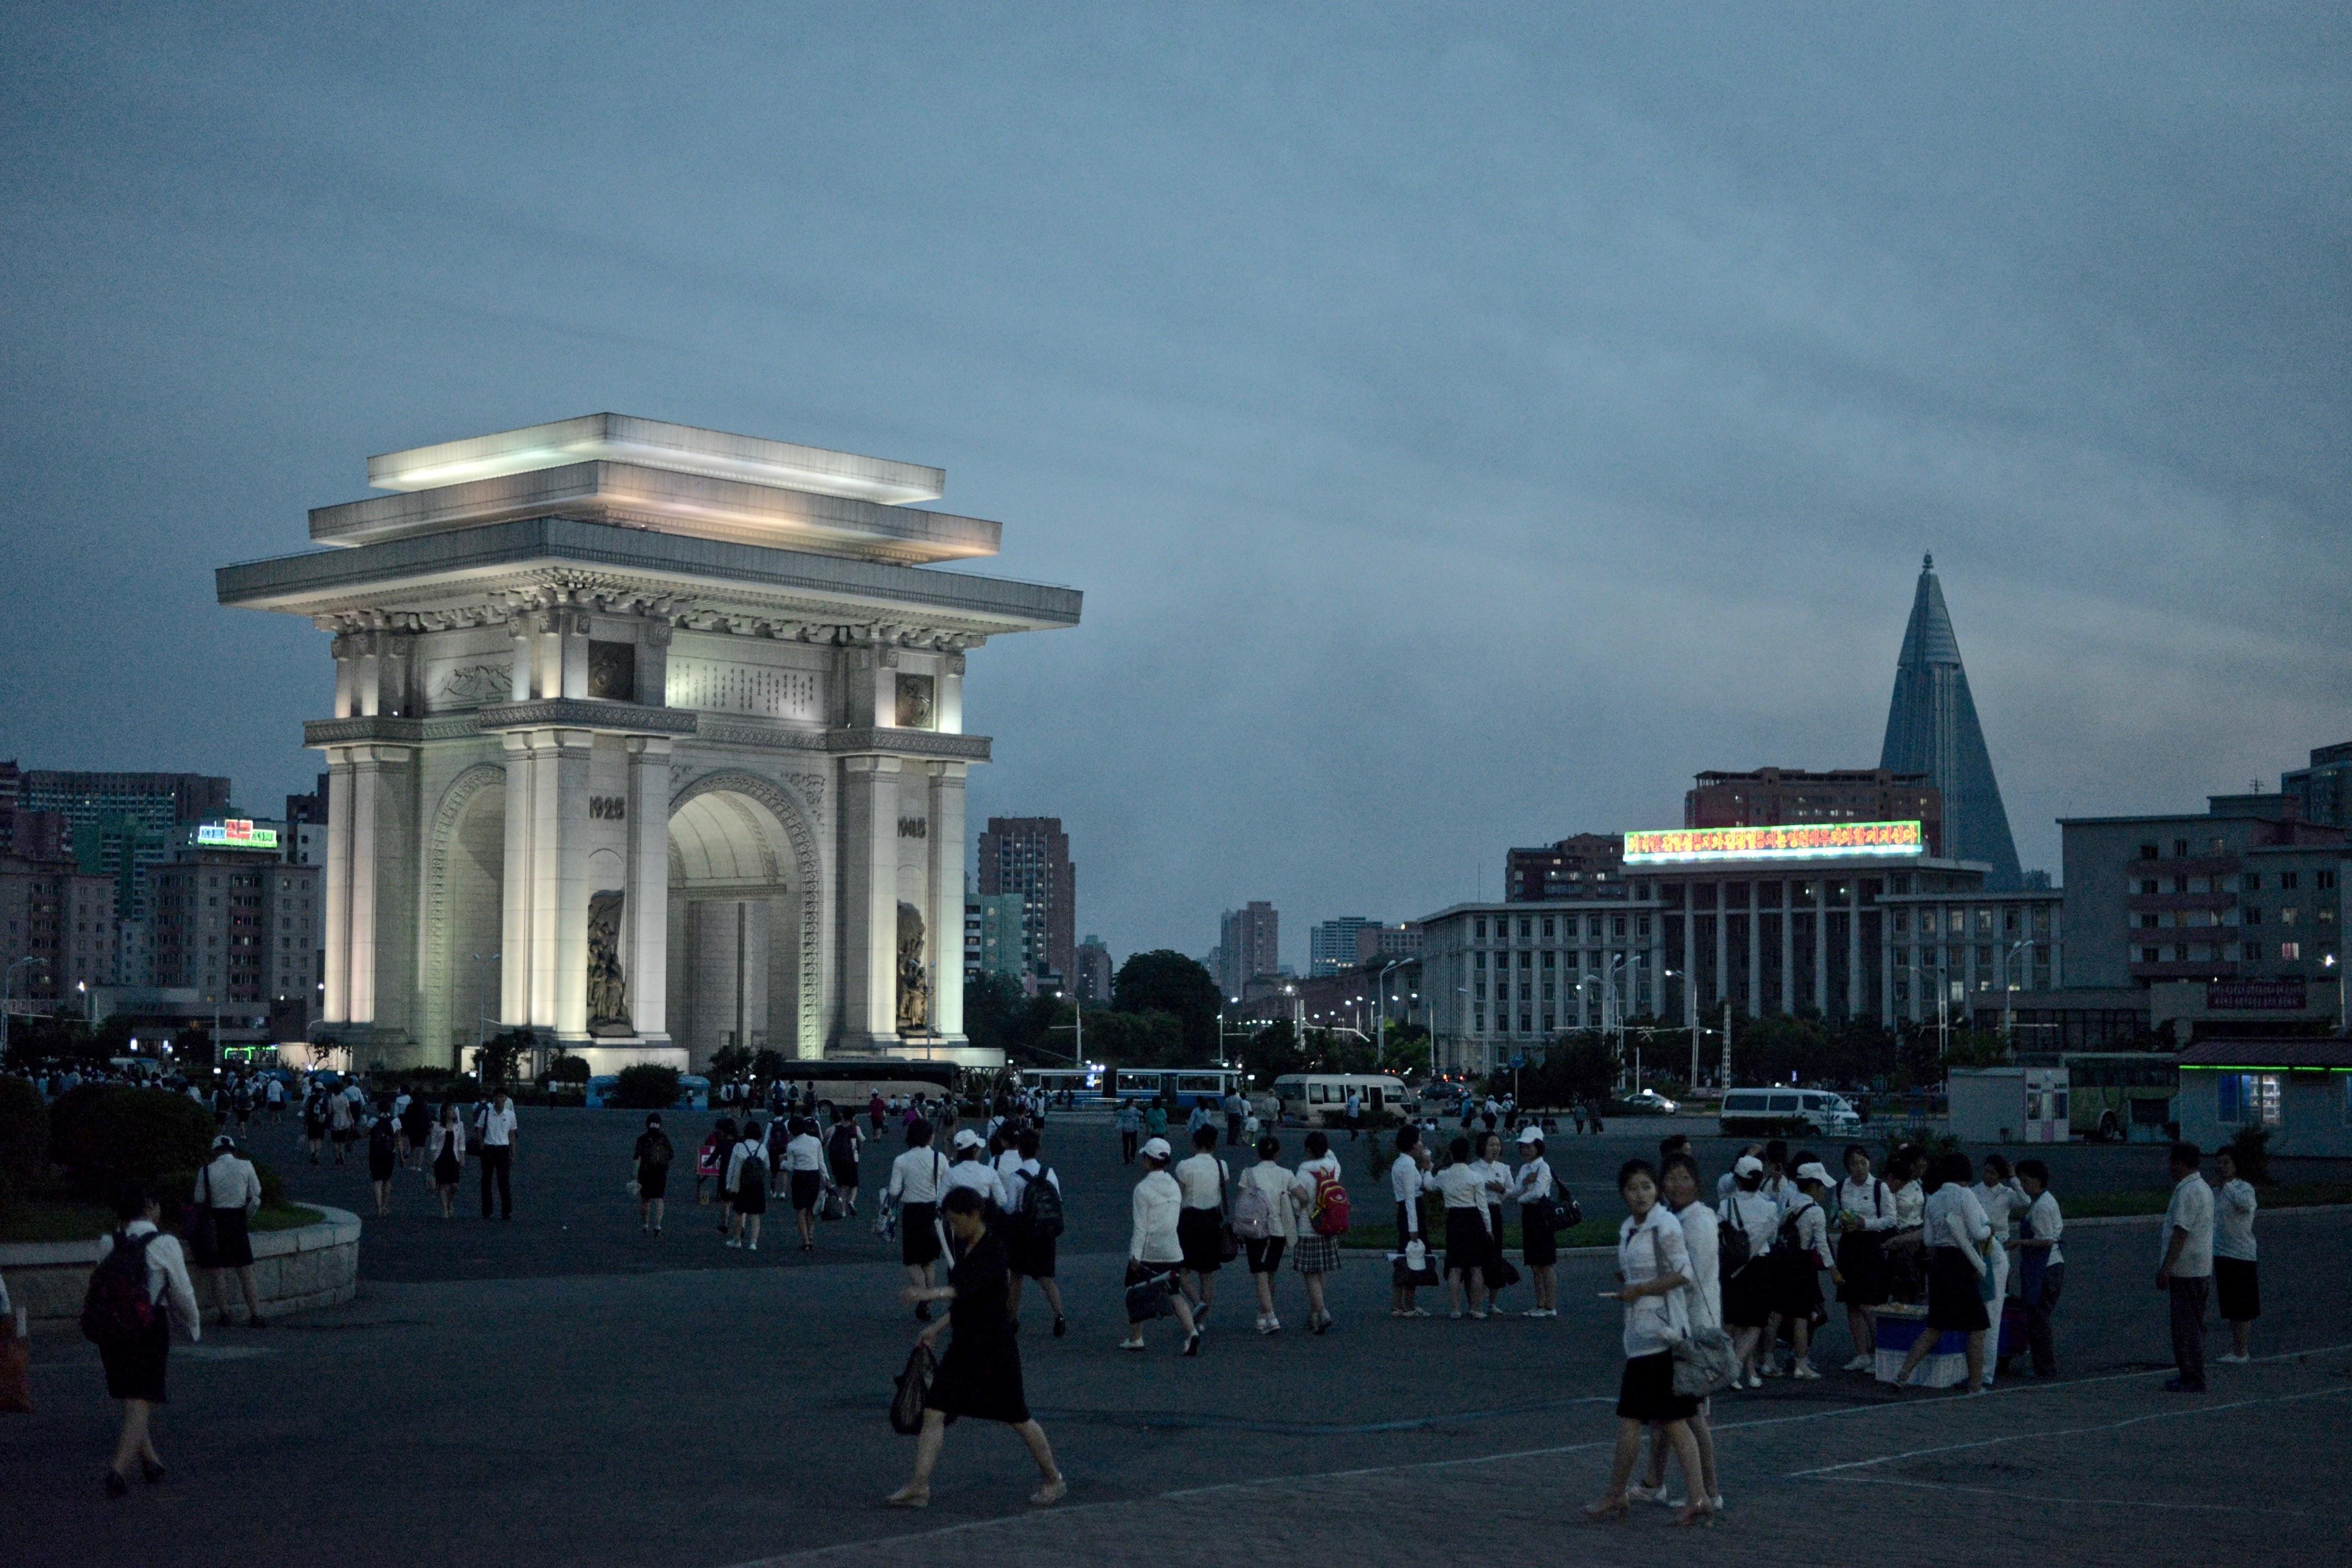 North Korea Night Time